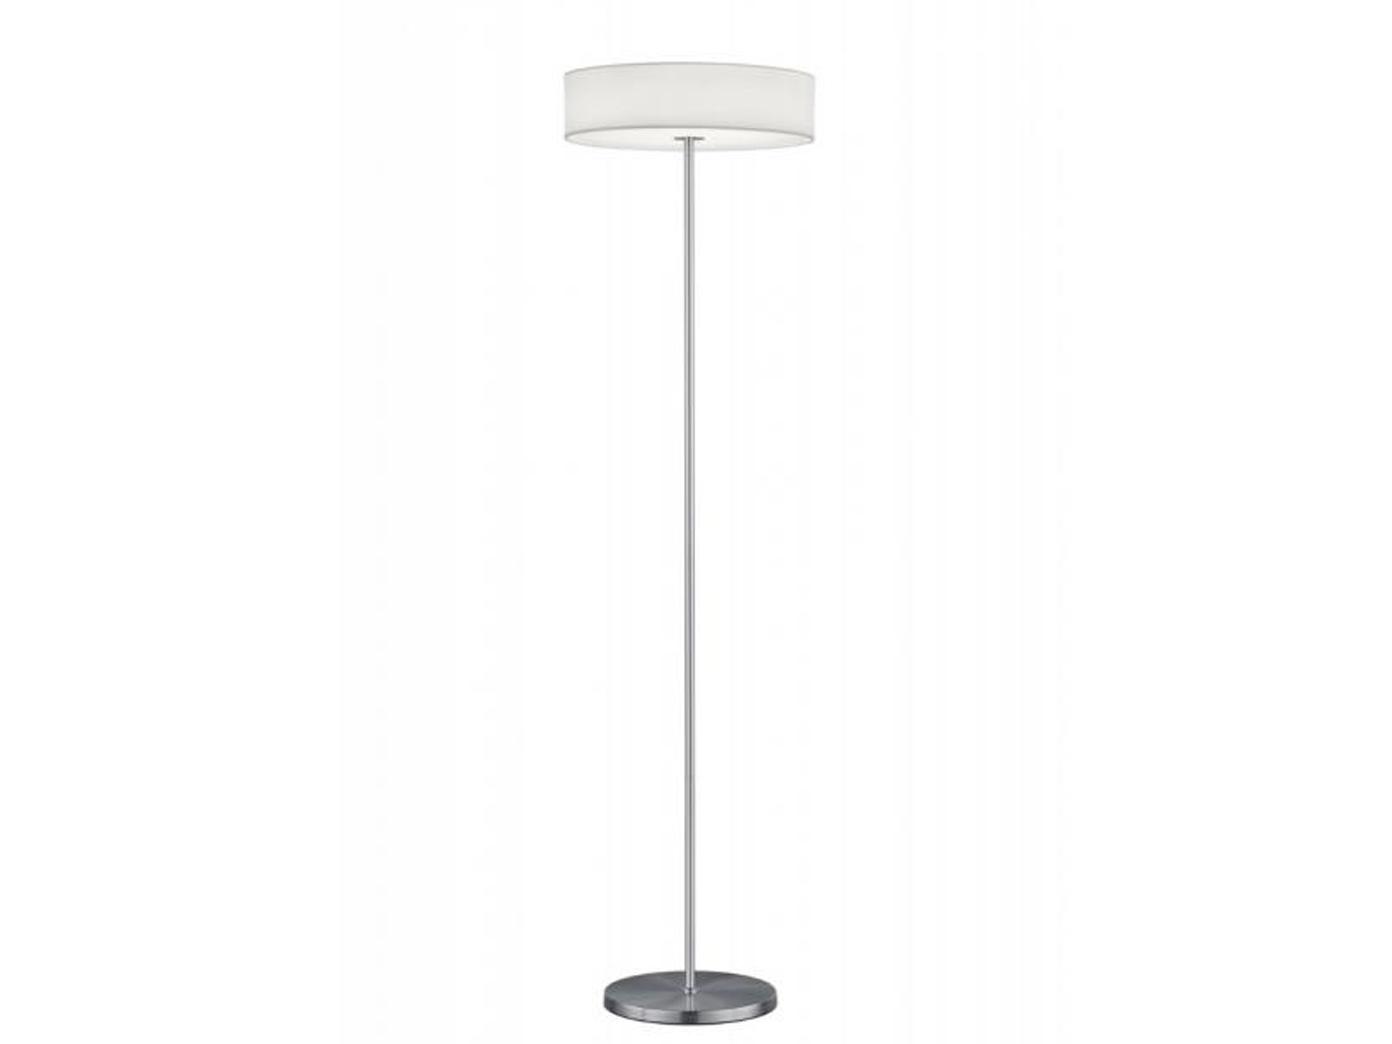 Trio LED Design Stehlampe LUGANO dimmbar, Stoffschirm weiß ...